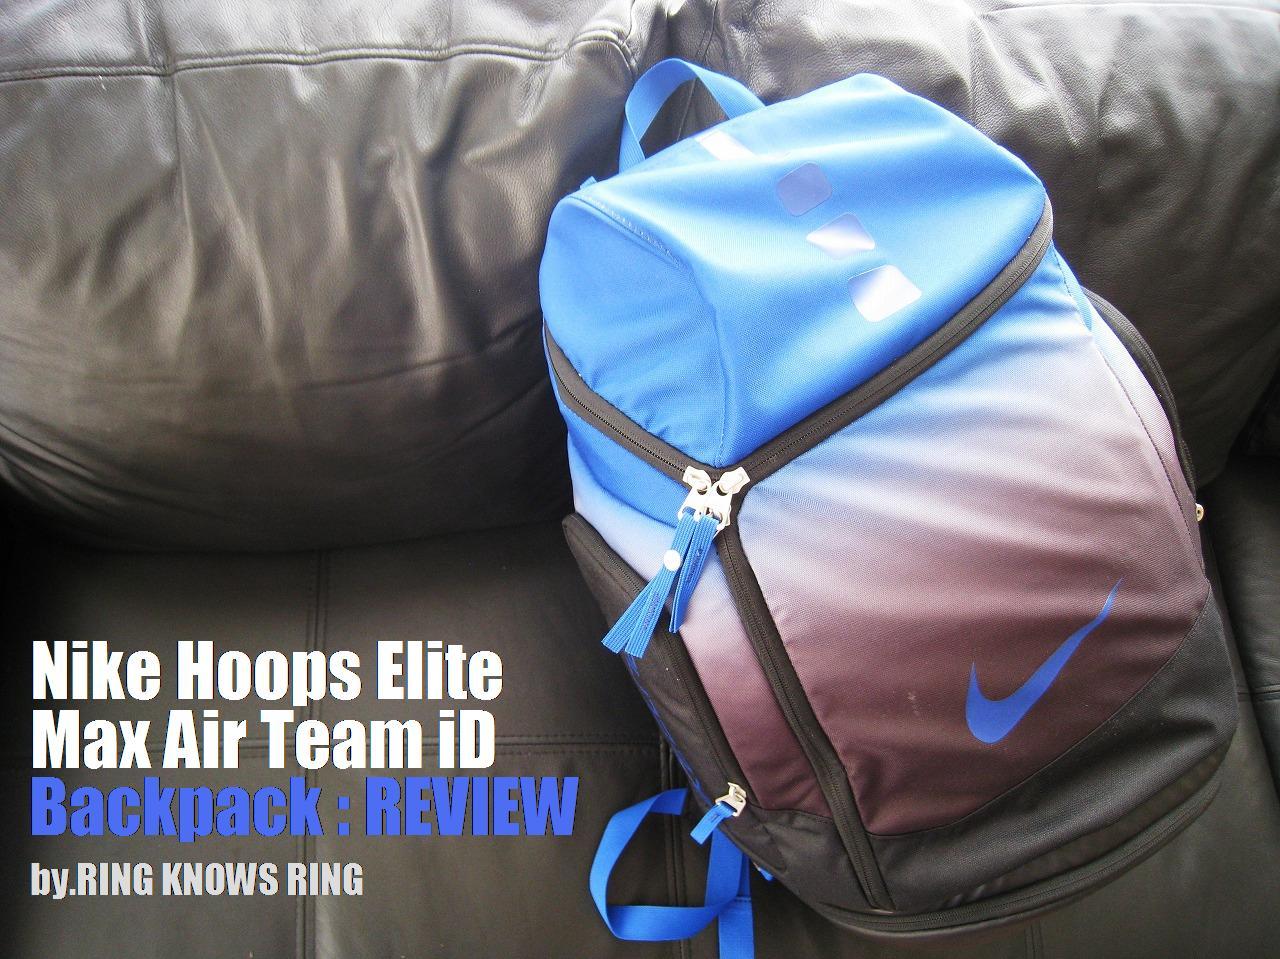 2bac47afd2 nike hoops elite max air team id